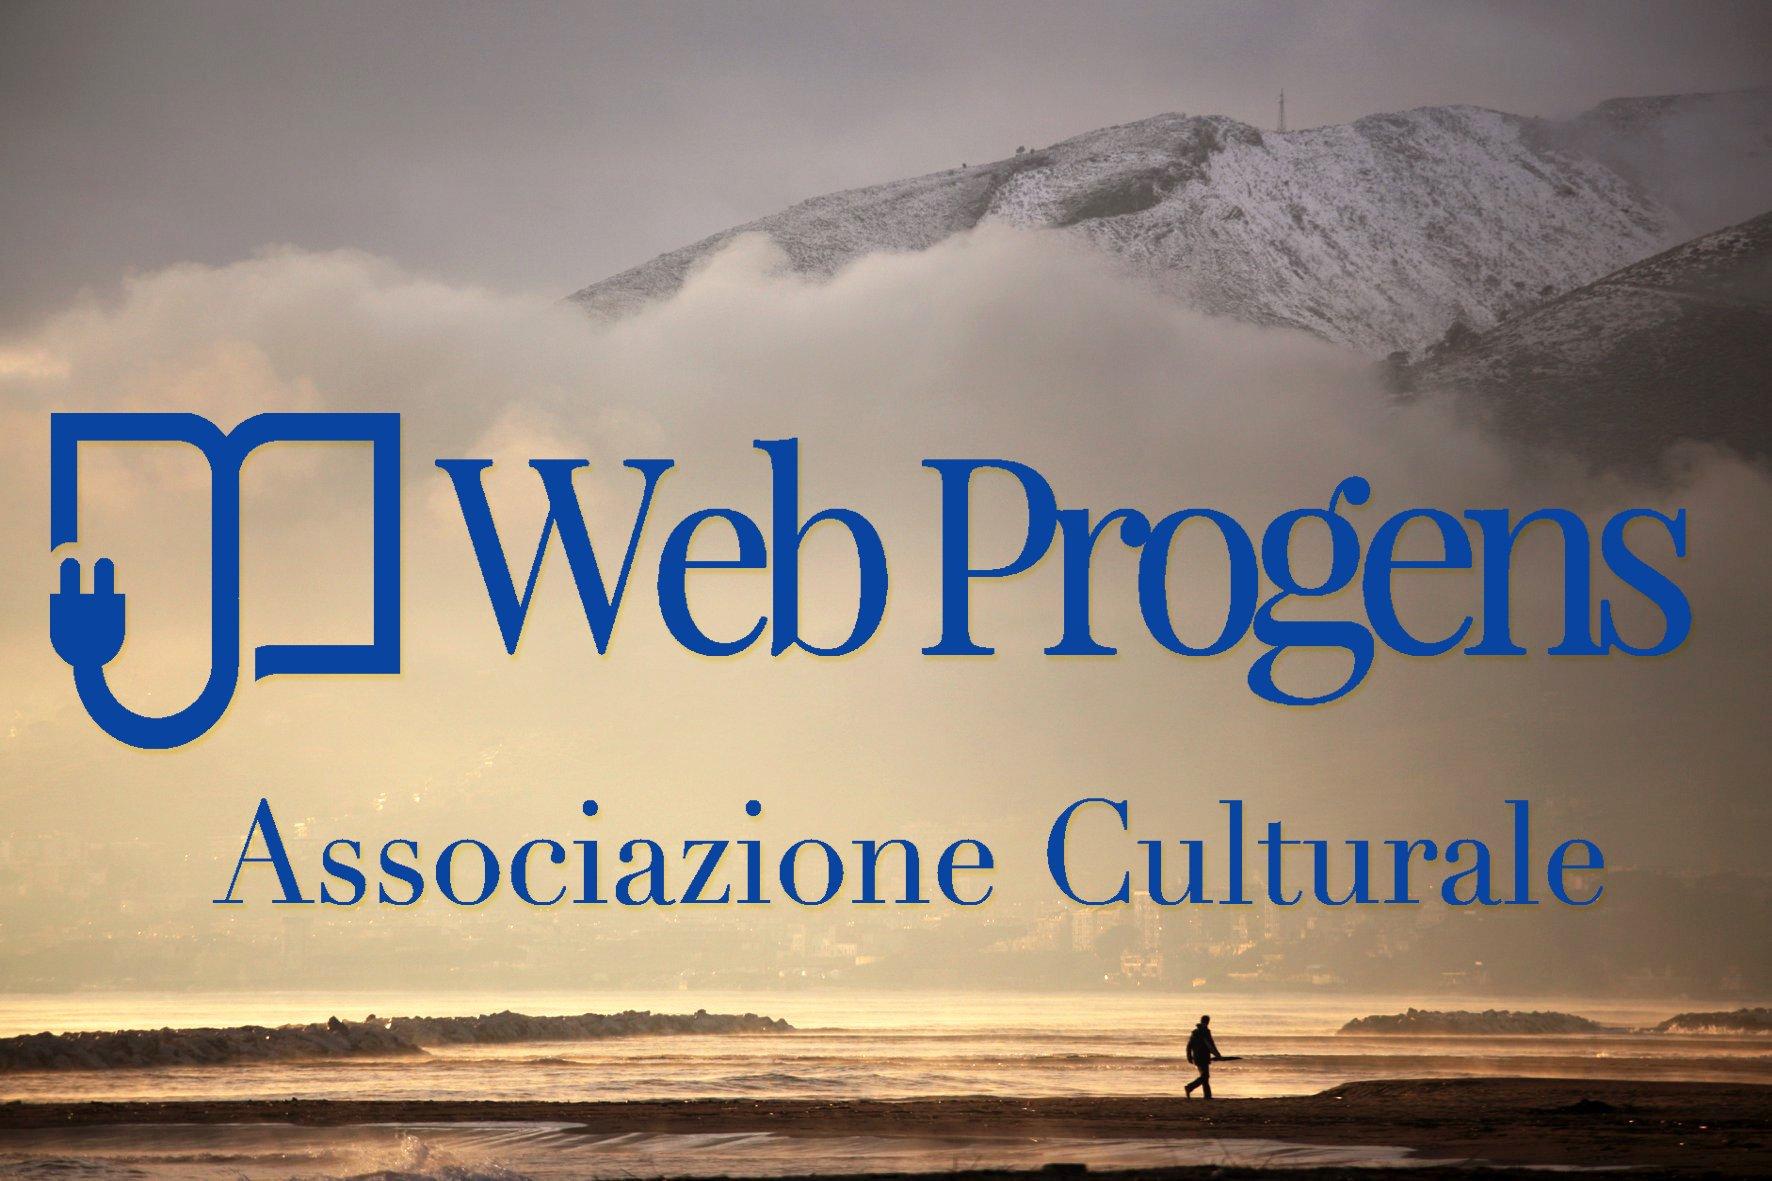 WEB PROGENS